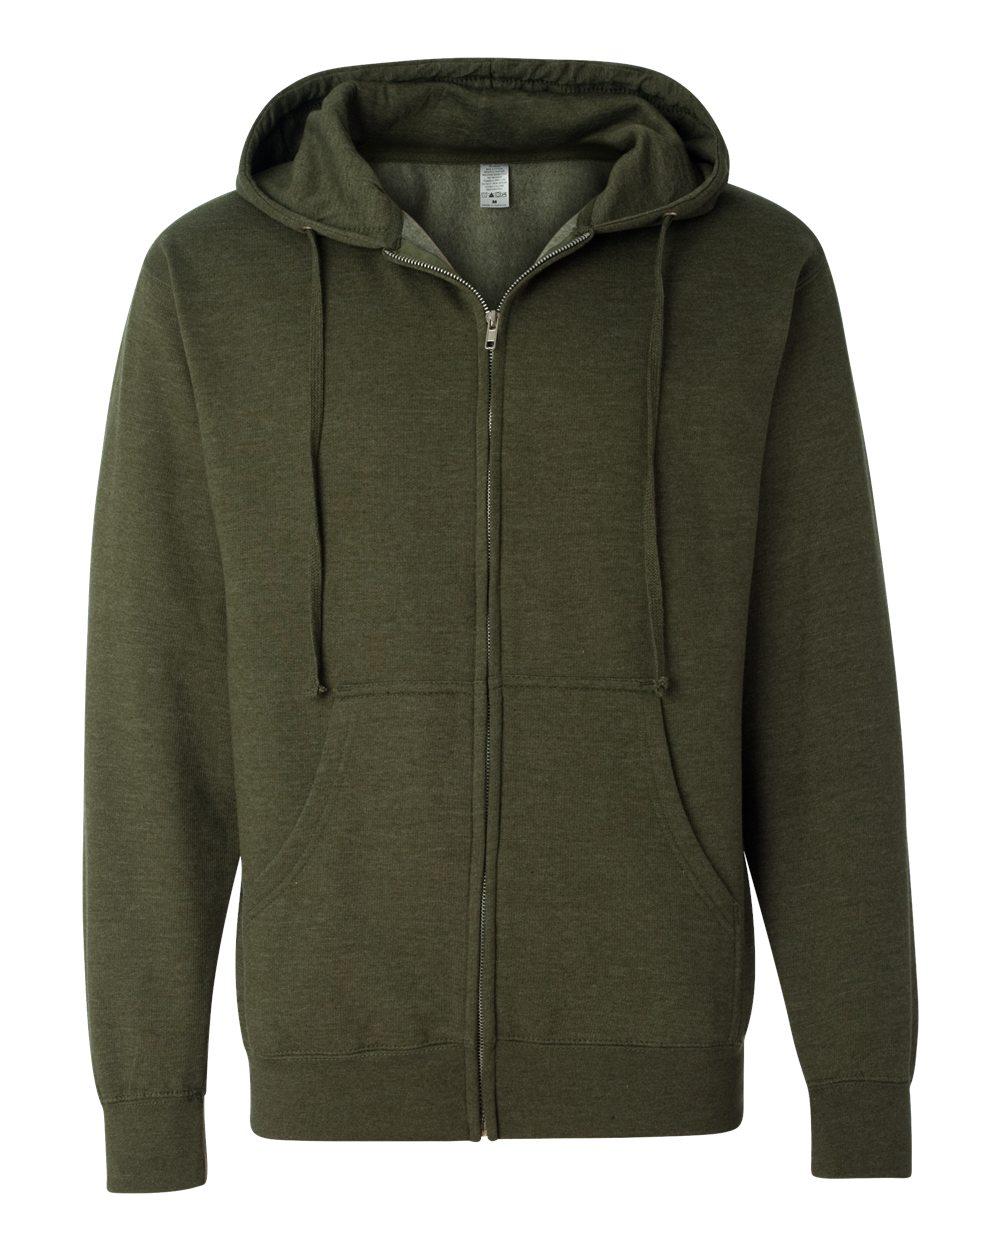 Picture of Midweight Full-Zip Hooded Sweatshirt